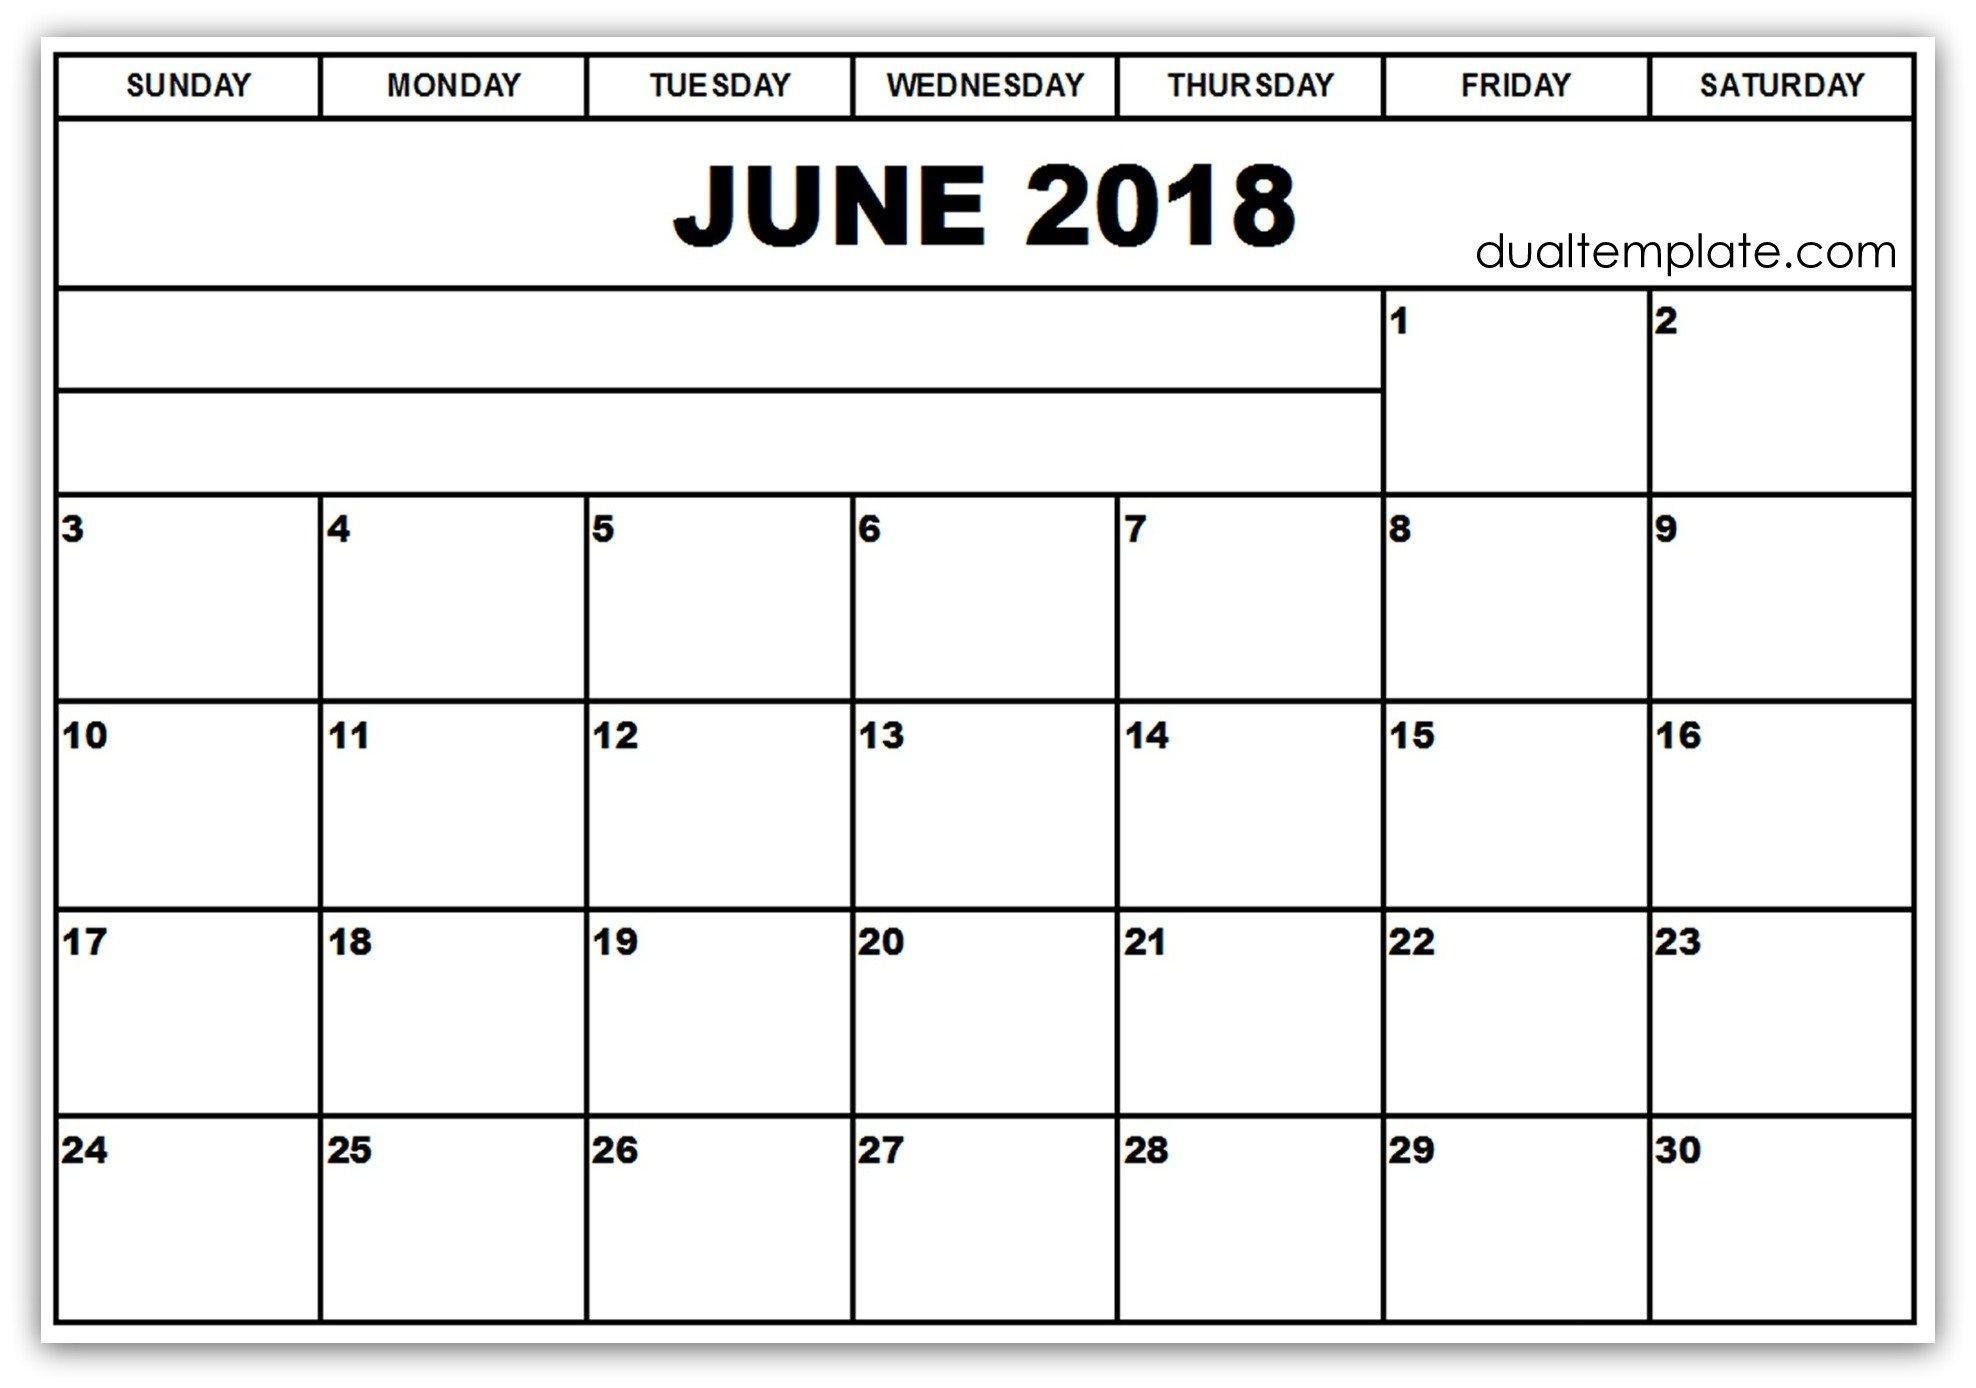 Calendario Enero 2019 Para Imprimir Recientes Julian Date Calendar Printable theminecraftserver Best Of Calendario Enero 2019 Para Imprimir Más Recientes Eur Lex R2447 En Eur Lex